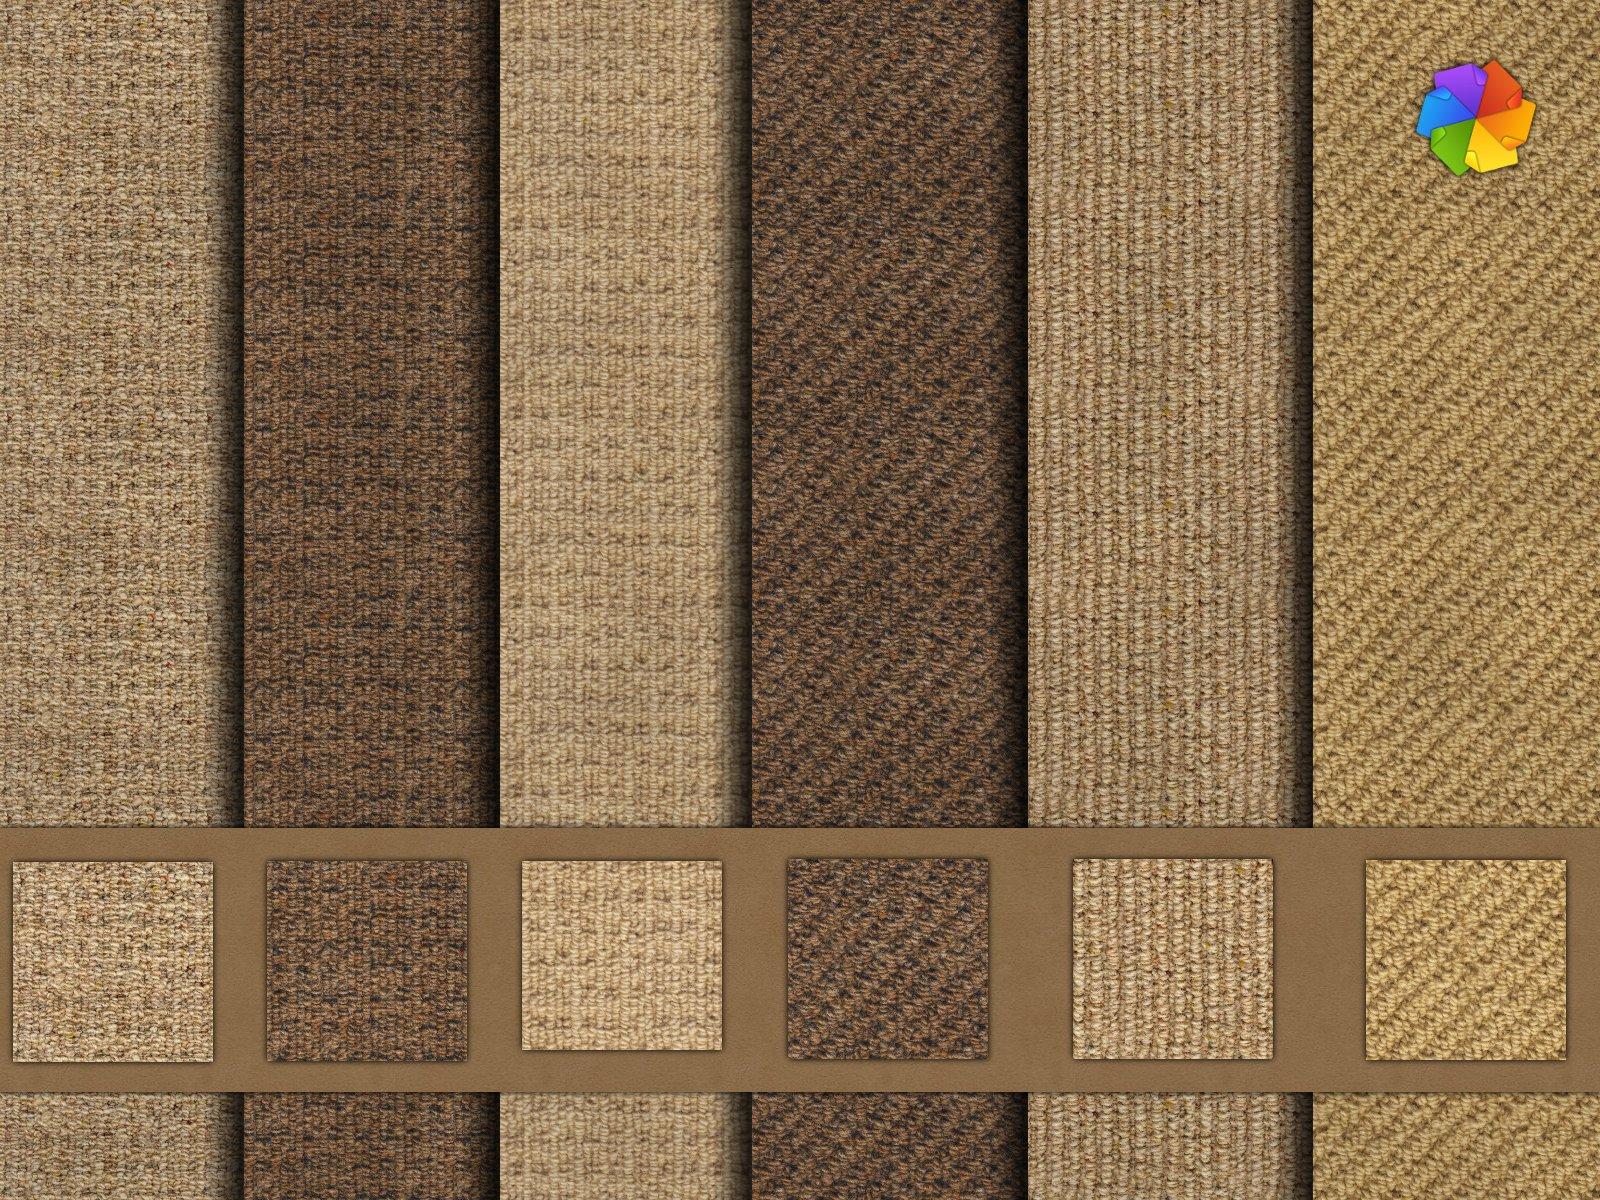 Rug Texture Stock Images RoyaltyFree Images amp Vectors